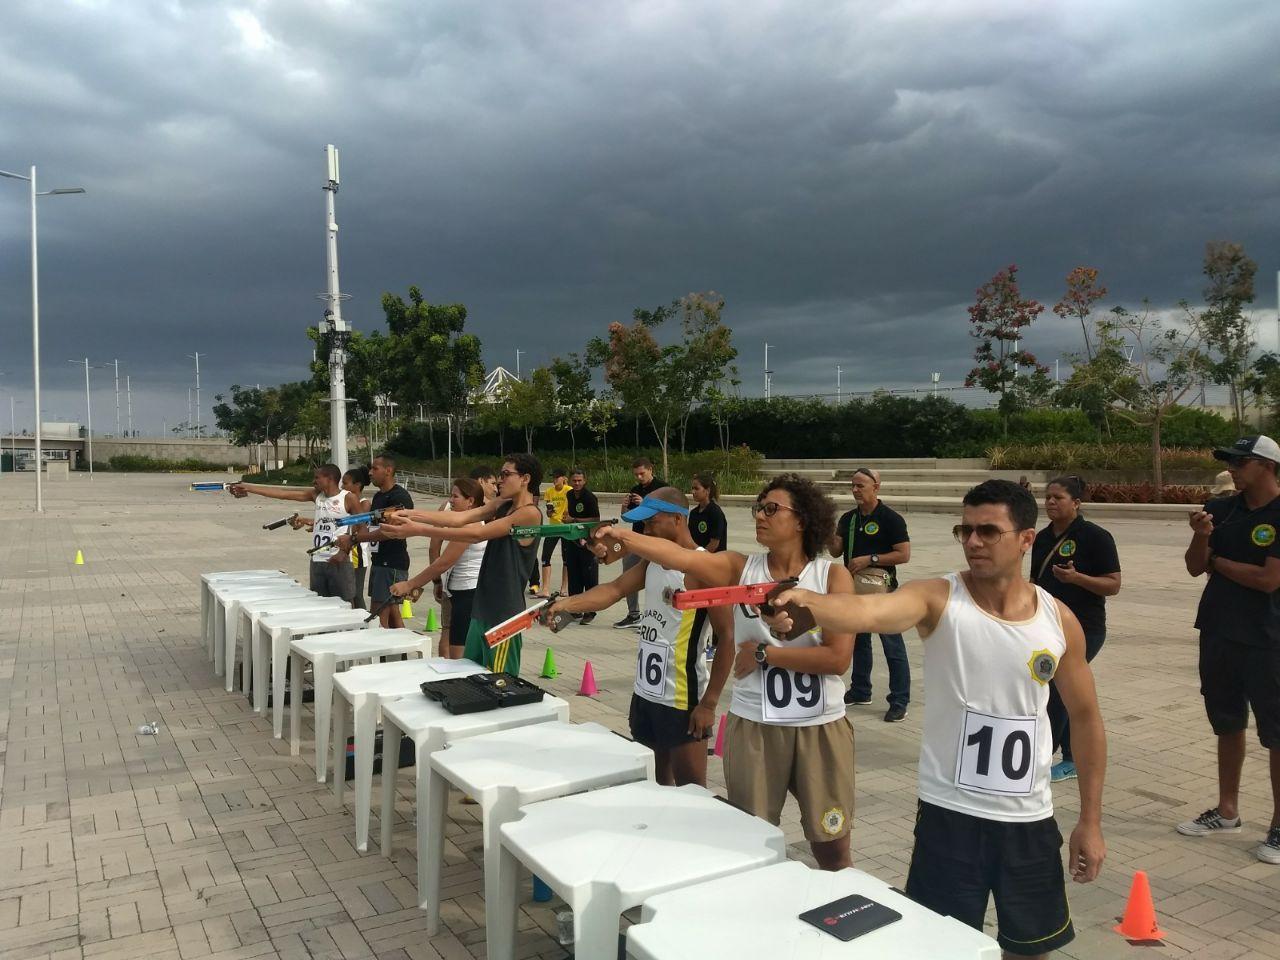 Guardas participam de competições de tetratlo e laser-run no Parque Olímpico